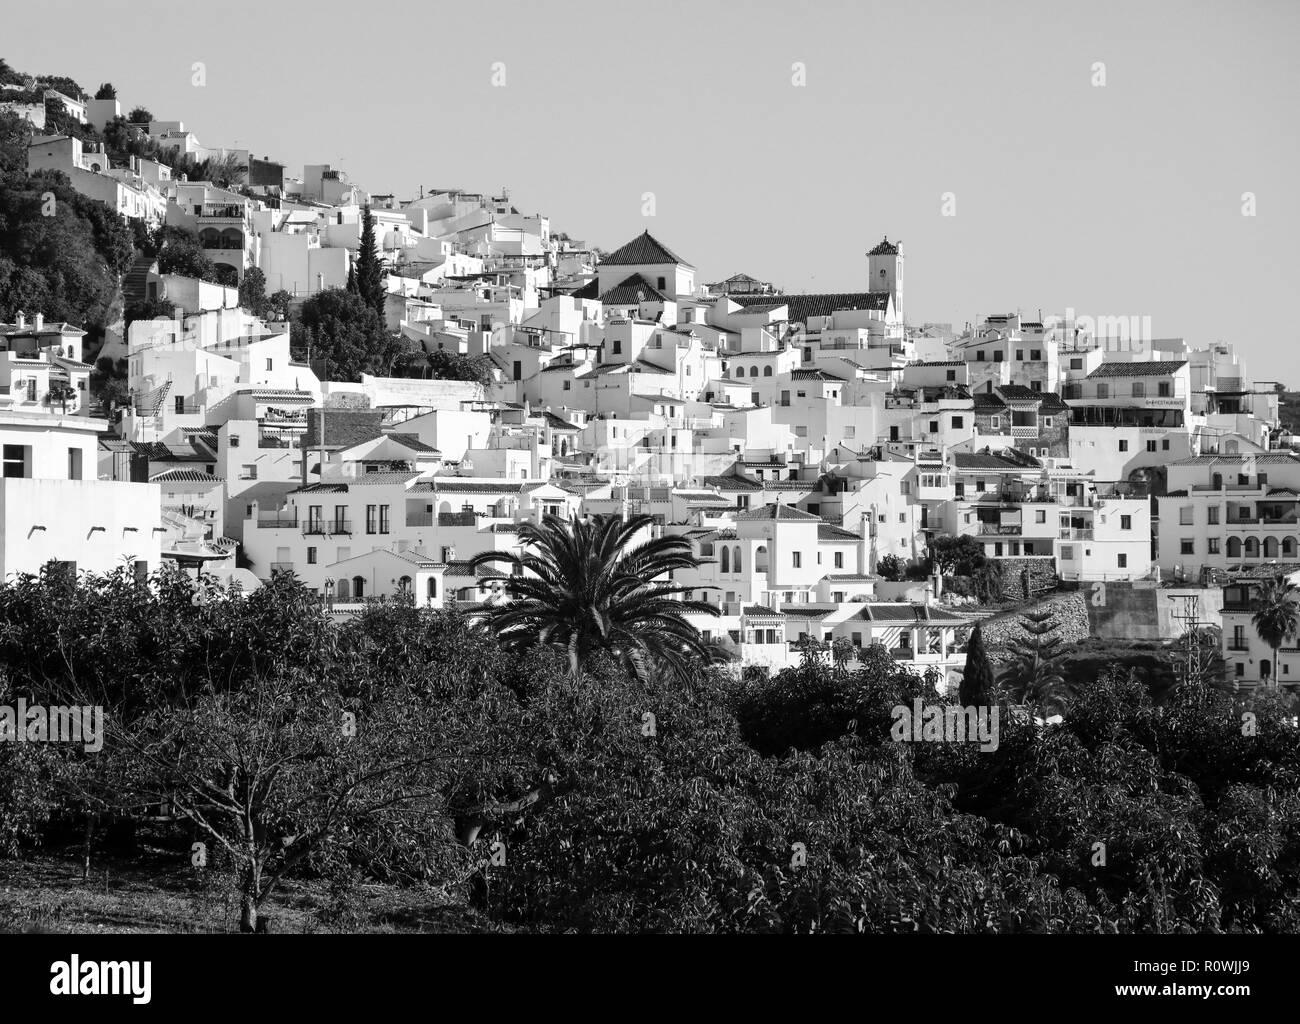 Frigiliana Spain in black and white - Stock Image